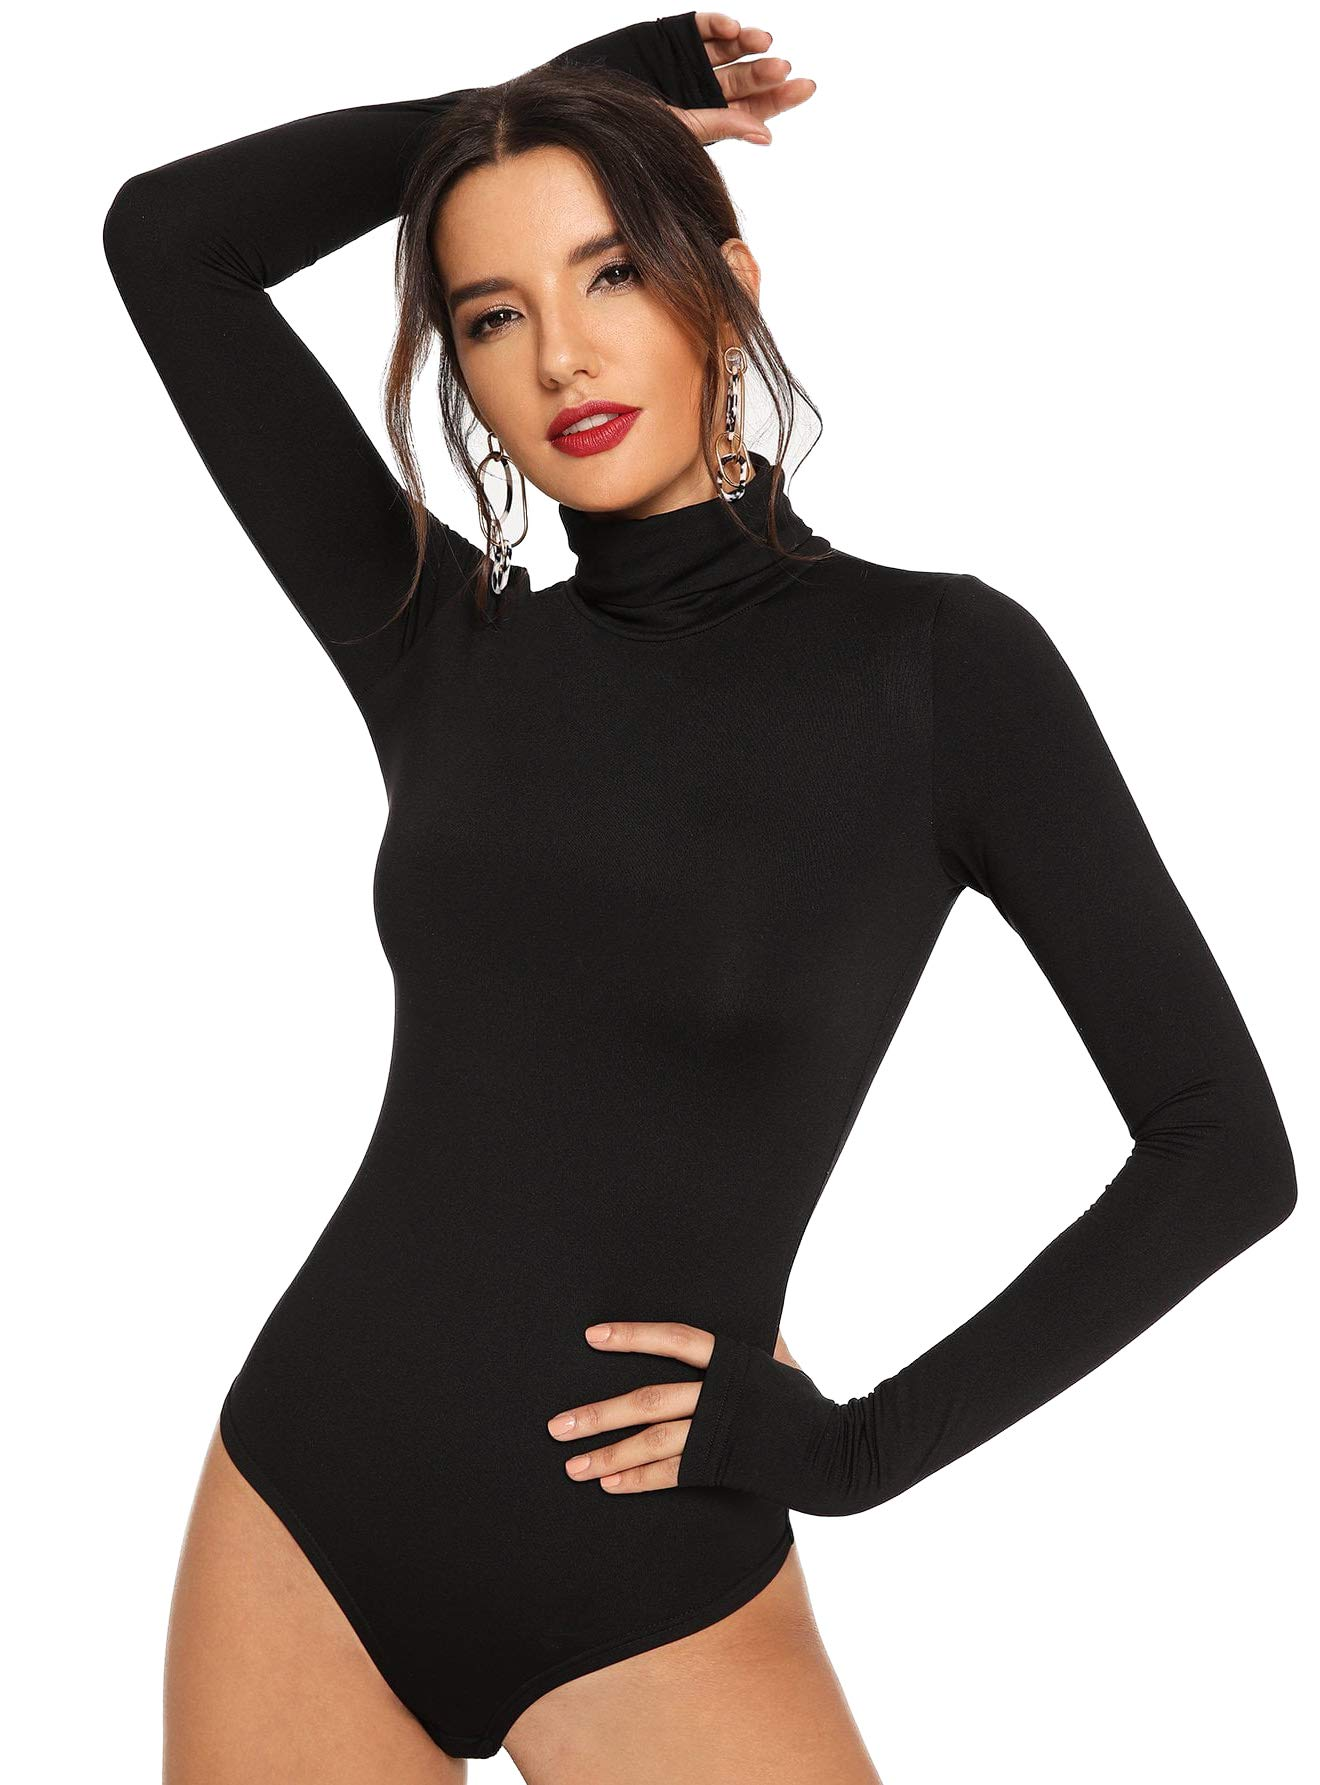 Floerns Womens Long Sleeve Turtleneck Basic Jumpsuits Bodysuit Leotard Black 1 Xl